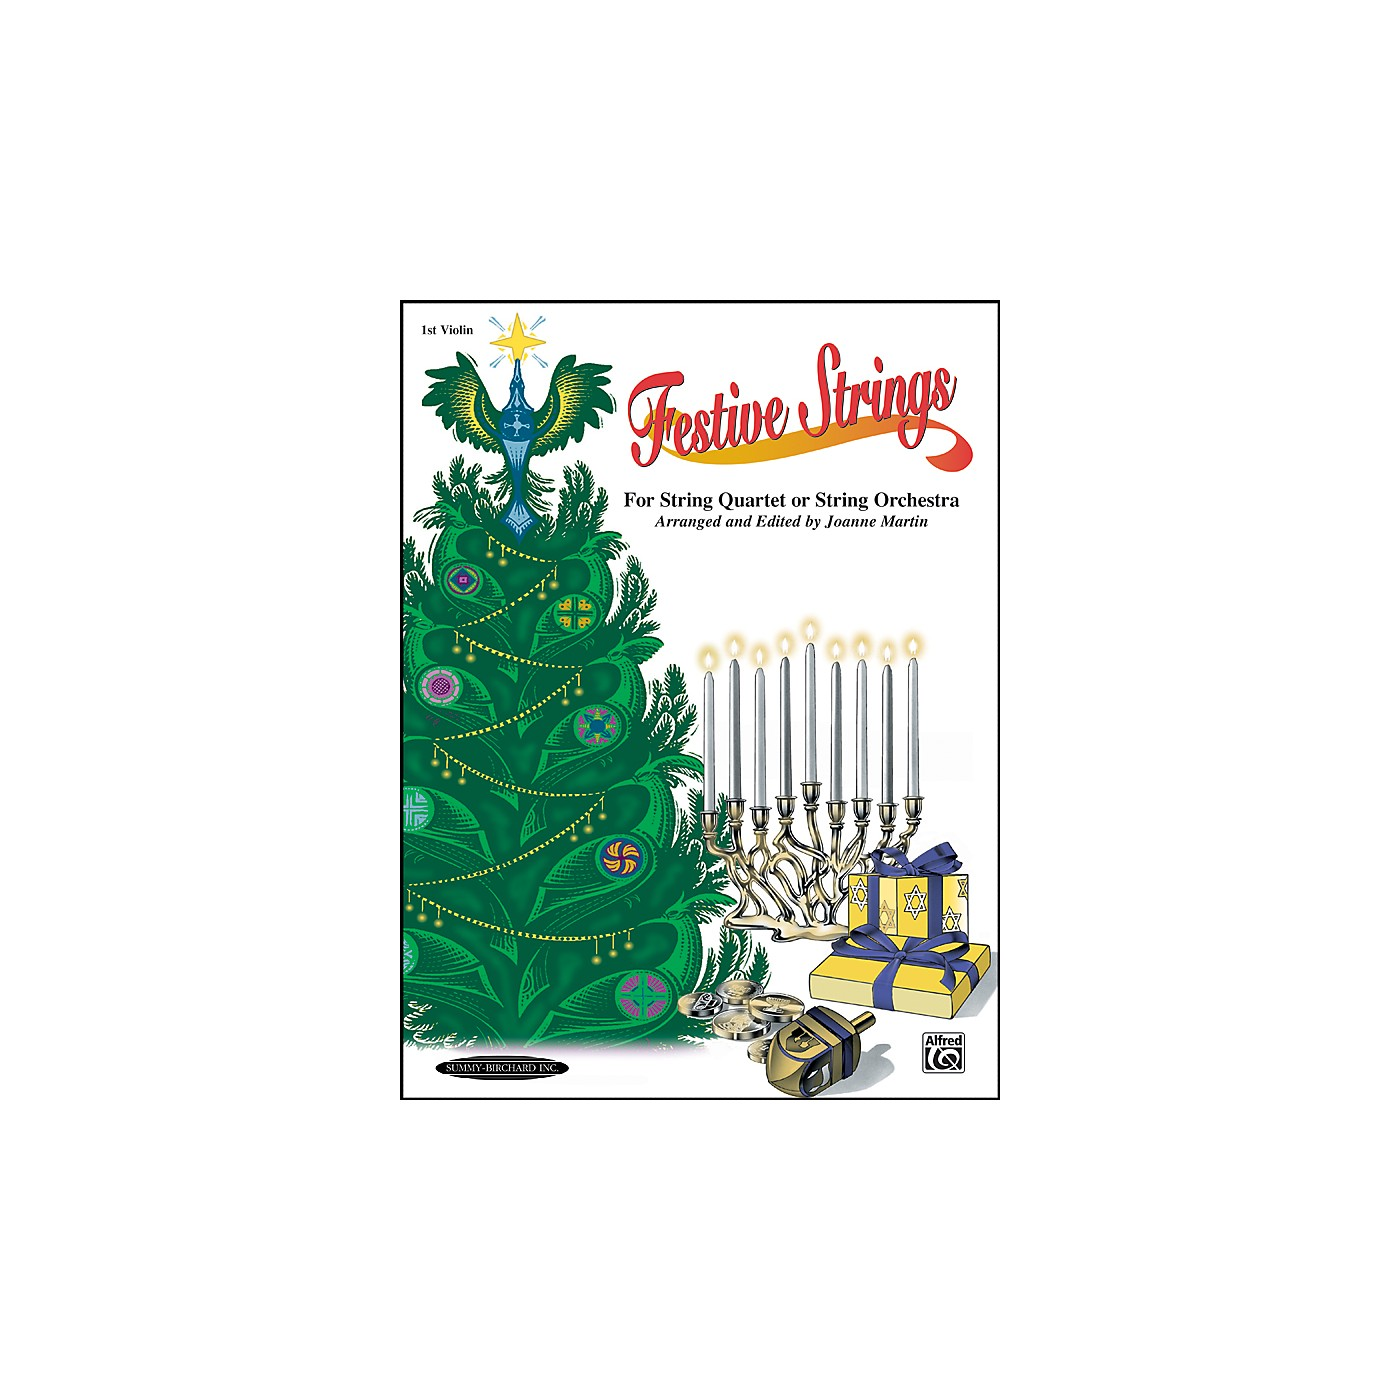 Alfred Festive Strings 1st Violin (Book) thumbnail